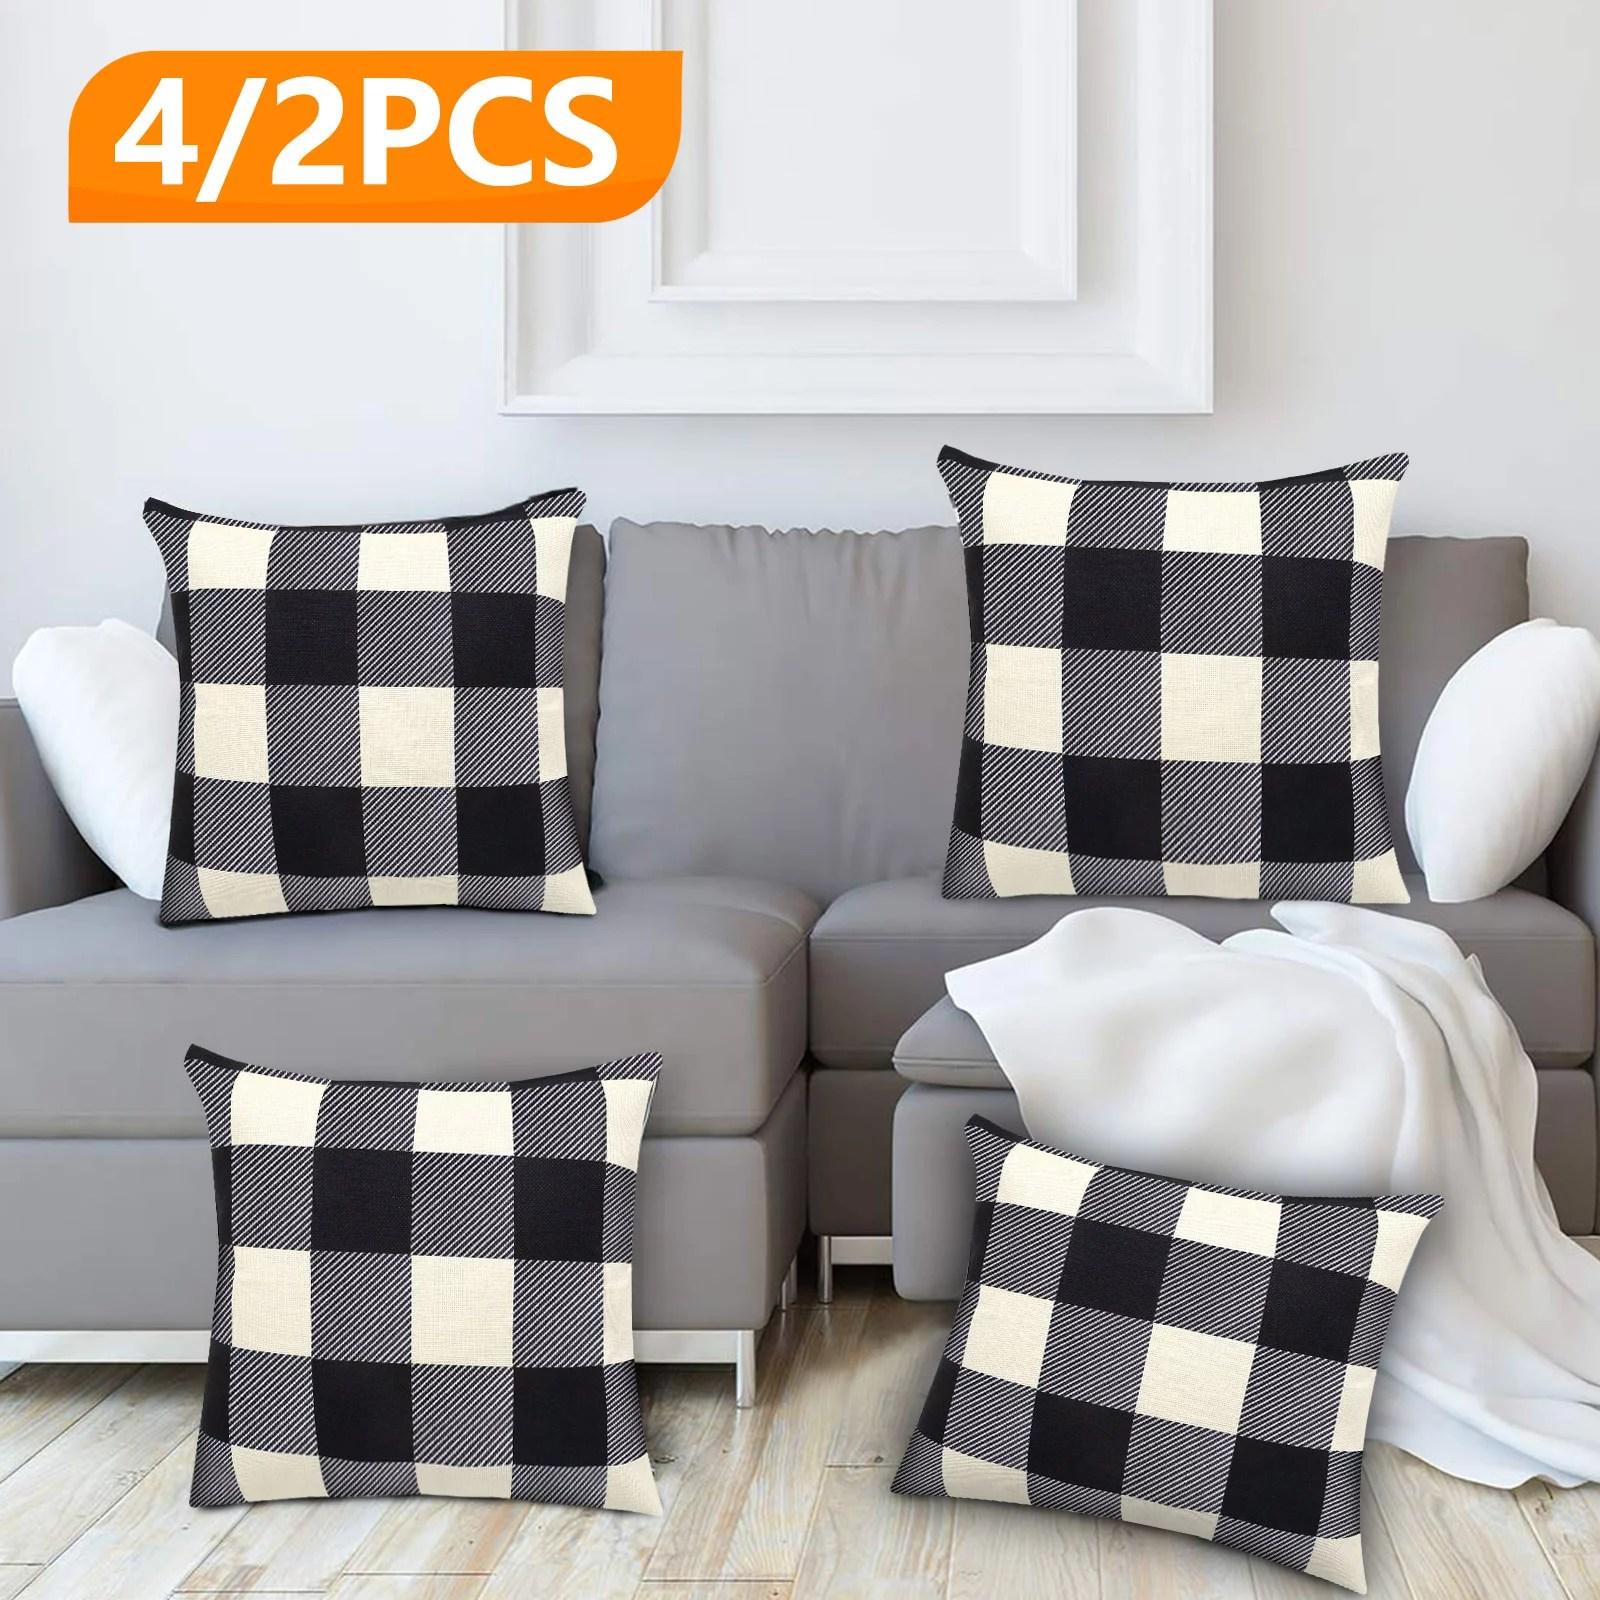 eeekit farmhouse decor pillow covers 18 x18 black white buffalo checkered plaid throw pillow covers set of 4 2 tartan linen soft cushion covers for